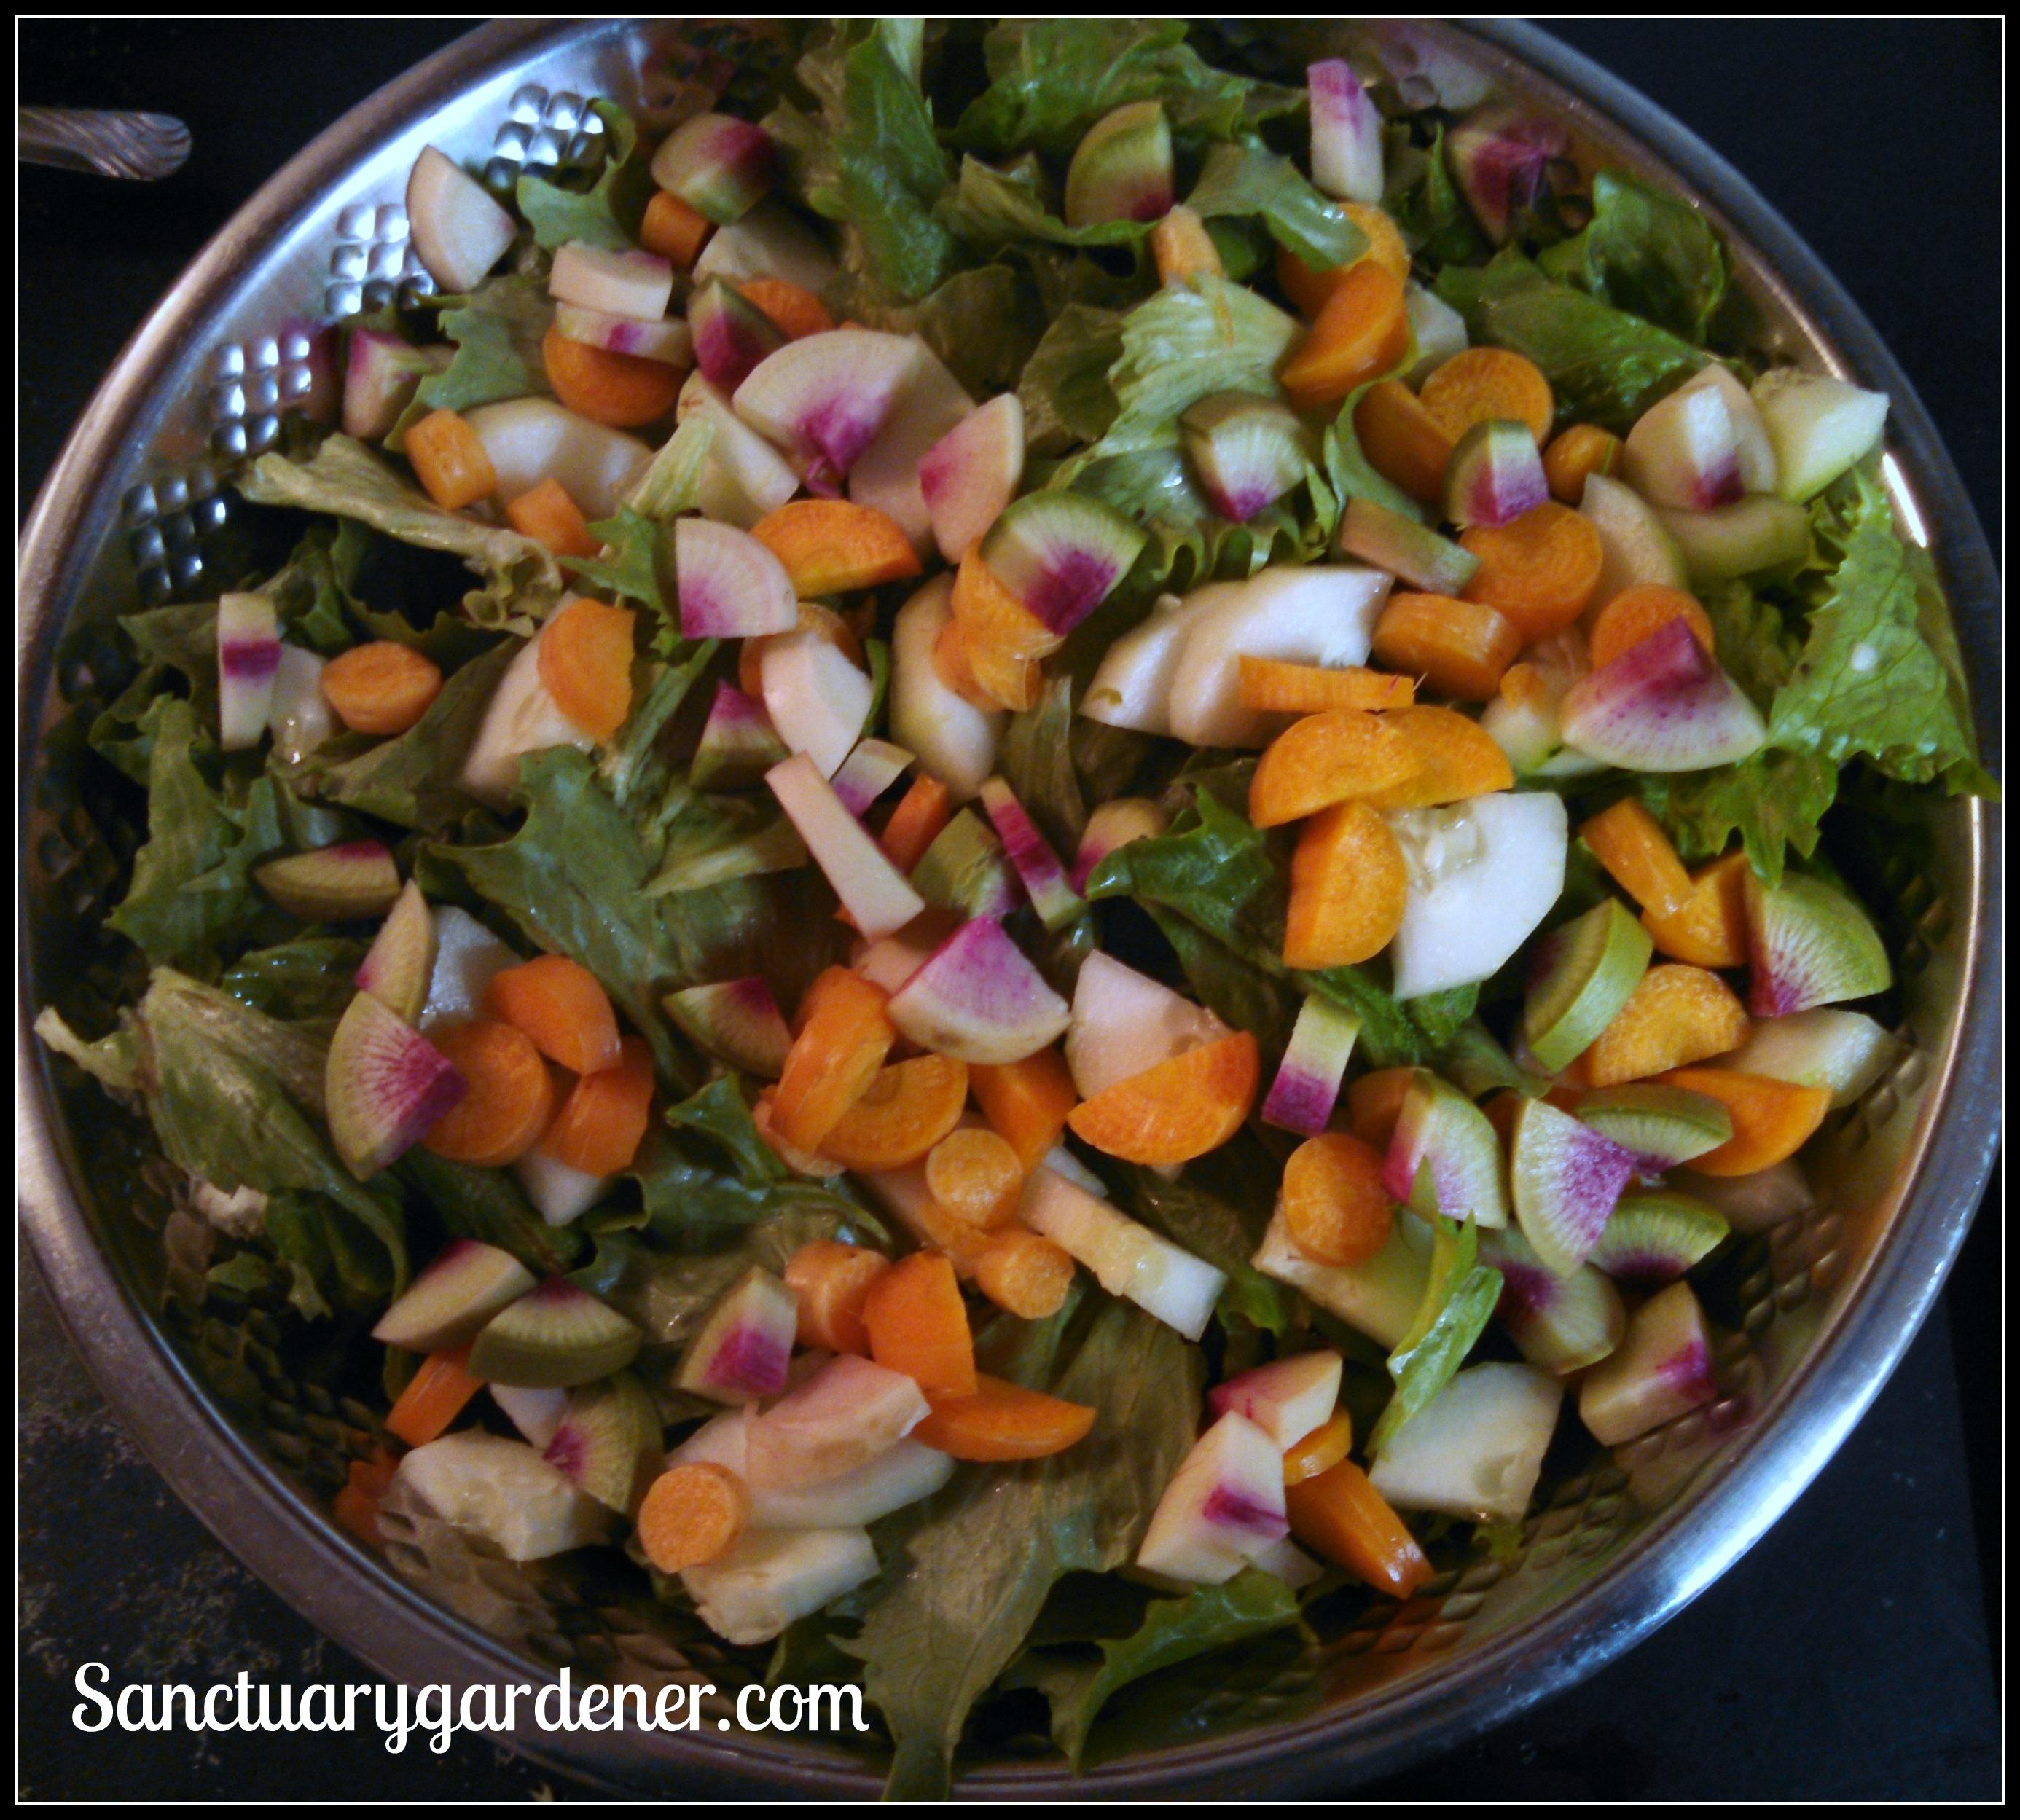 Sanctuary gardener update 1 26 15 sanctuary gardener - Salade reine des glaces ...